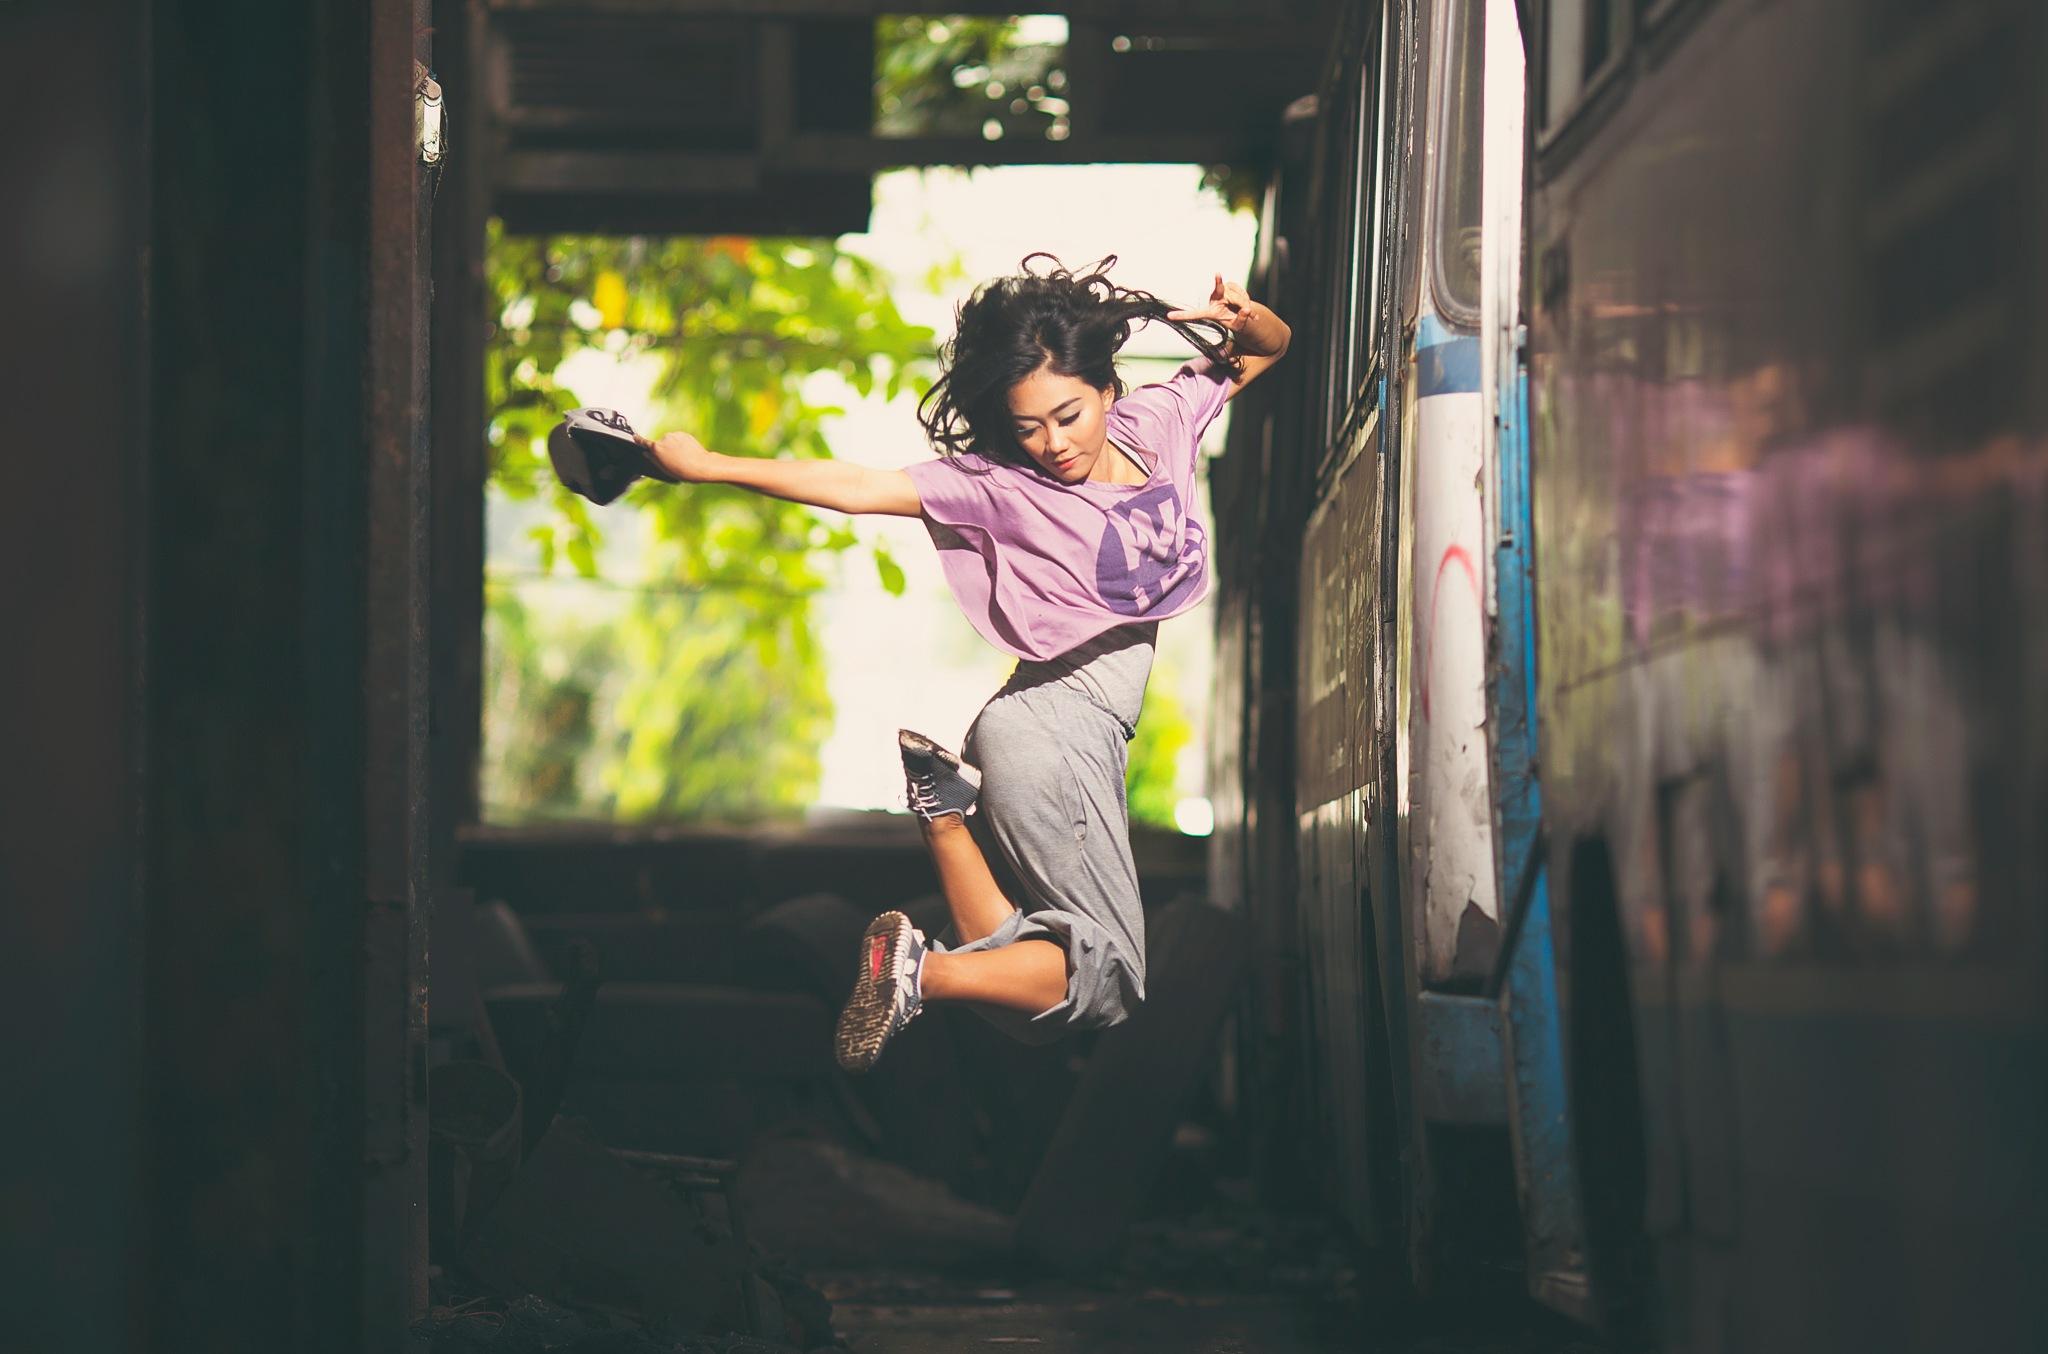 lets dance by Yunus